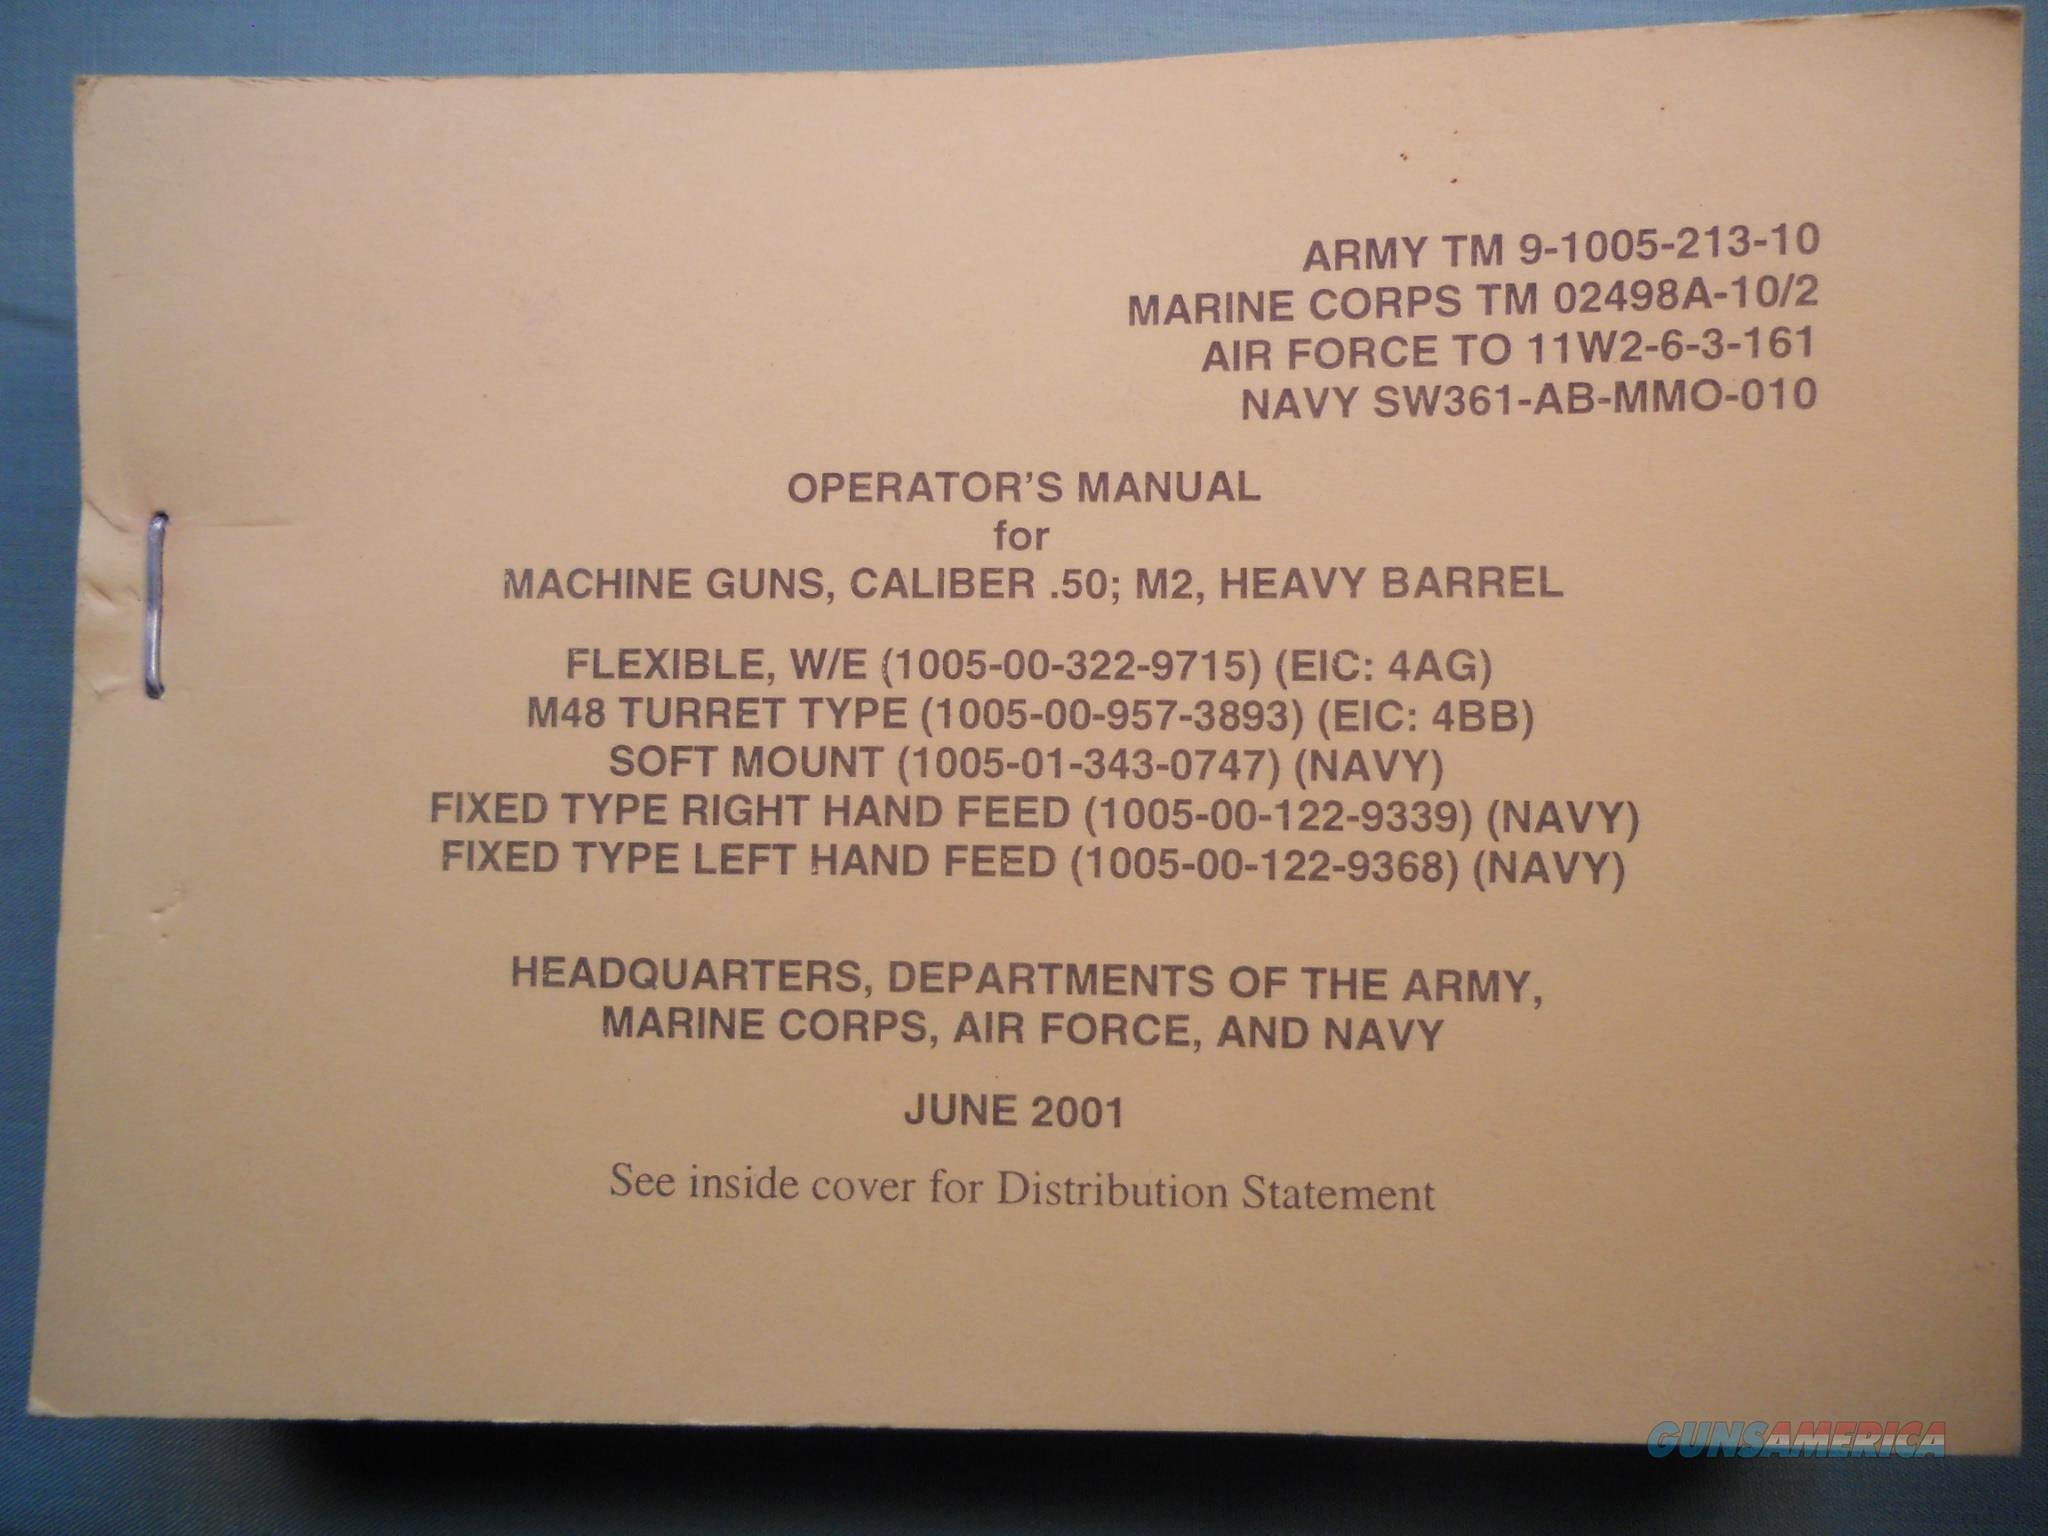 Technical Manual TM 9-1005-213-10 machine gun .50 caliber M2 Heavy Barrel   Non-Guns > Magazines & Clips > Subgun Magazines > Clips > Other